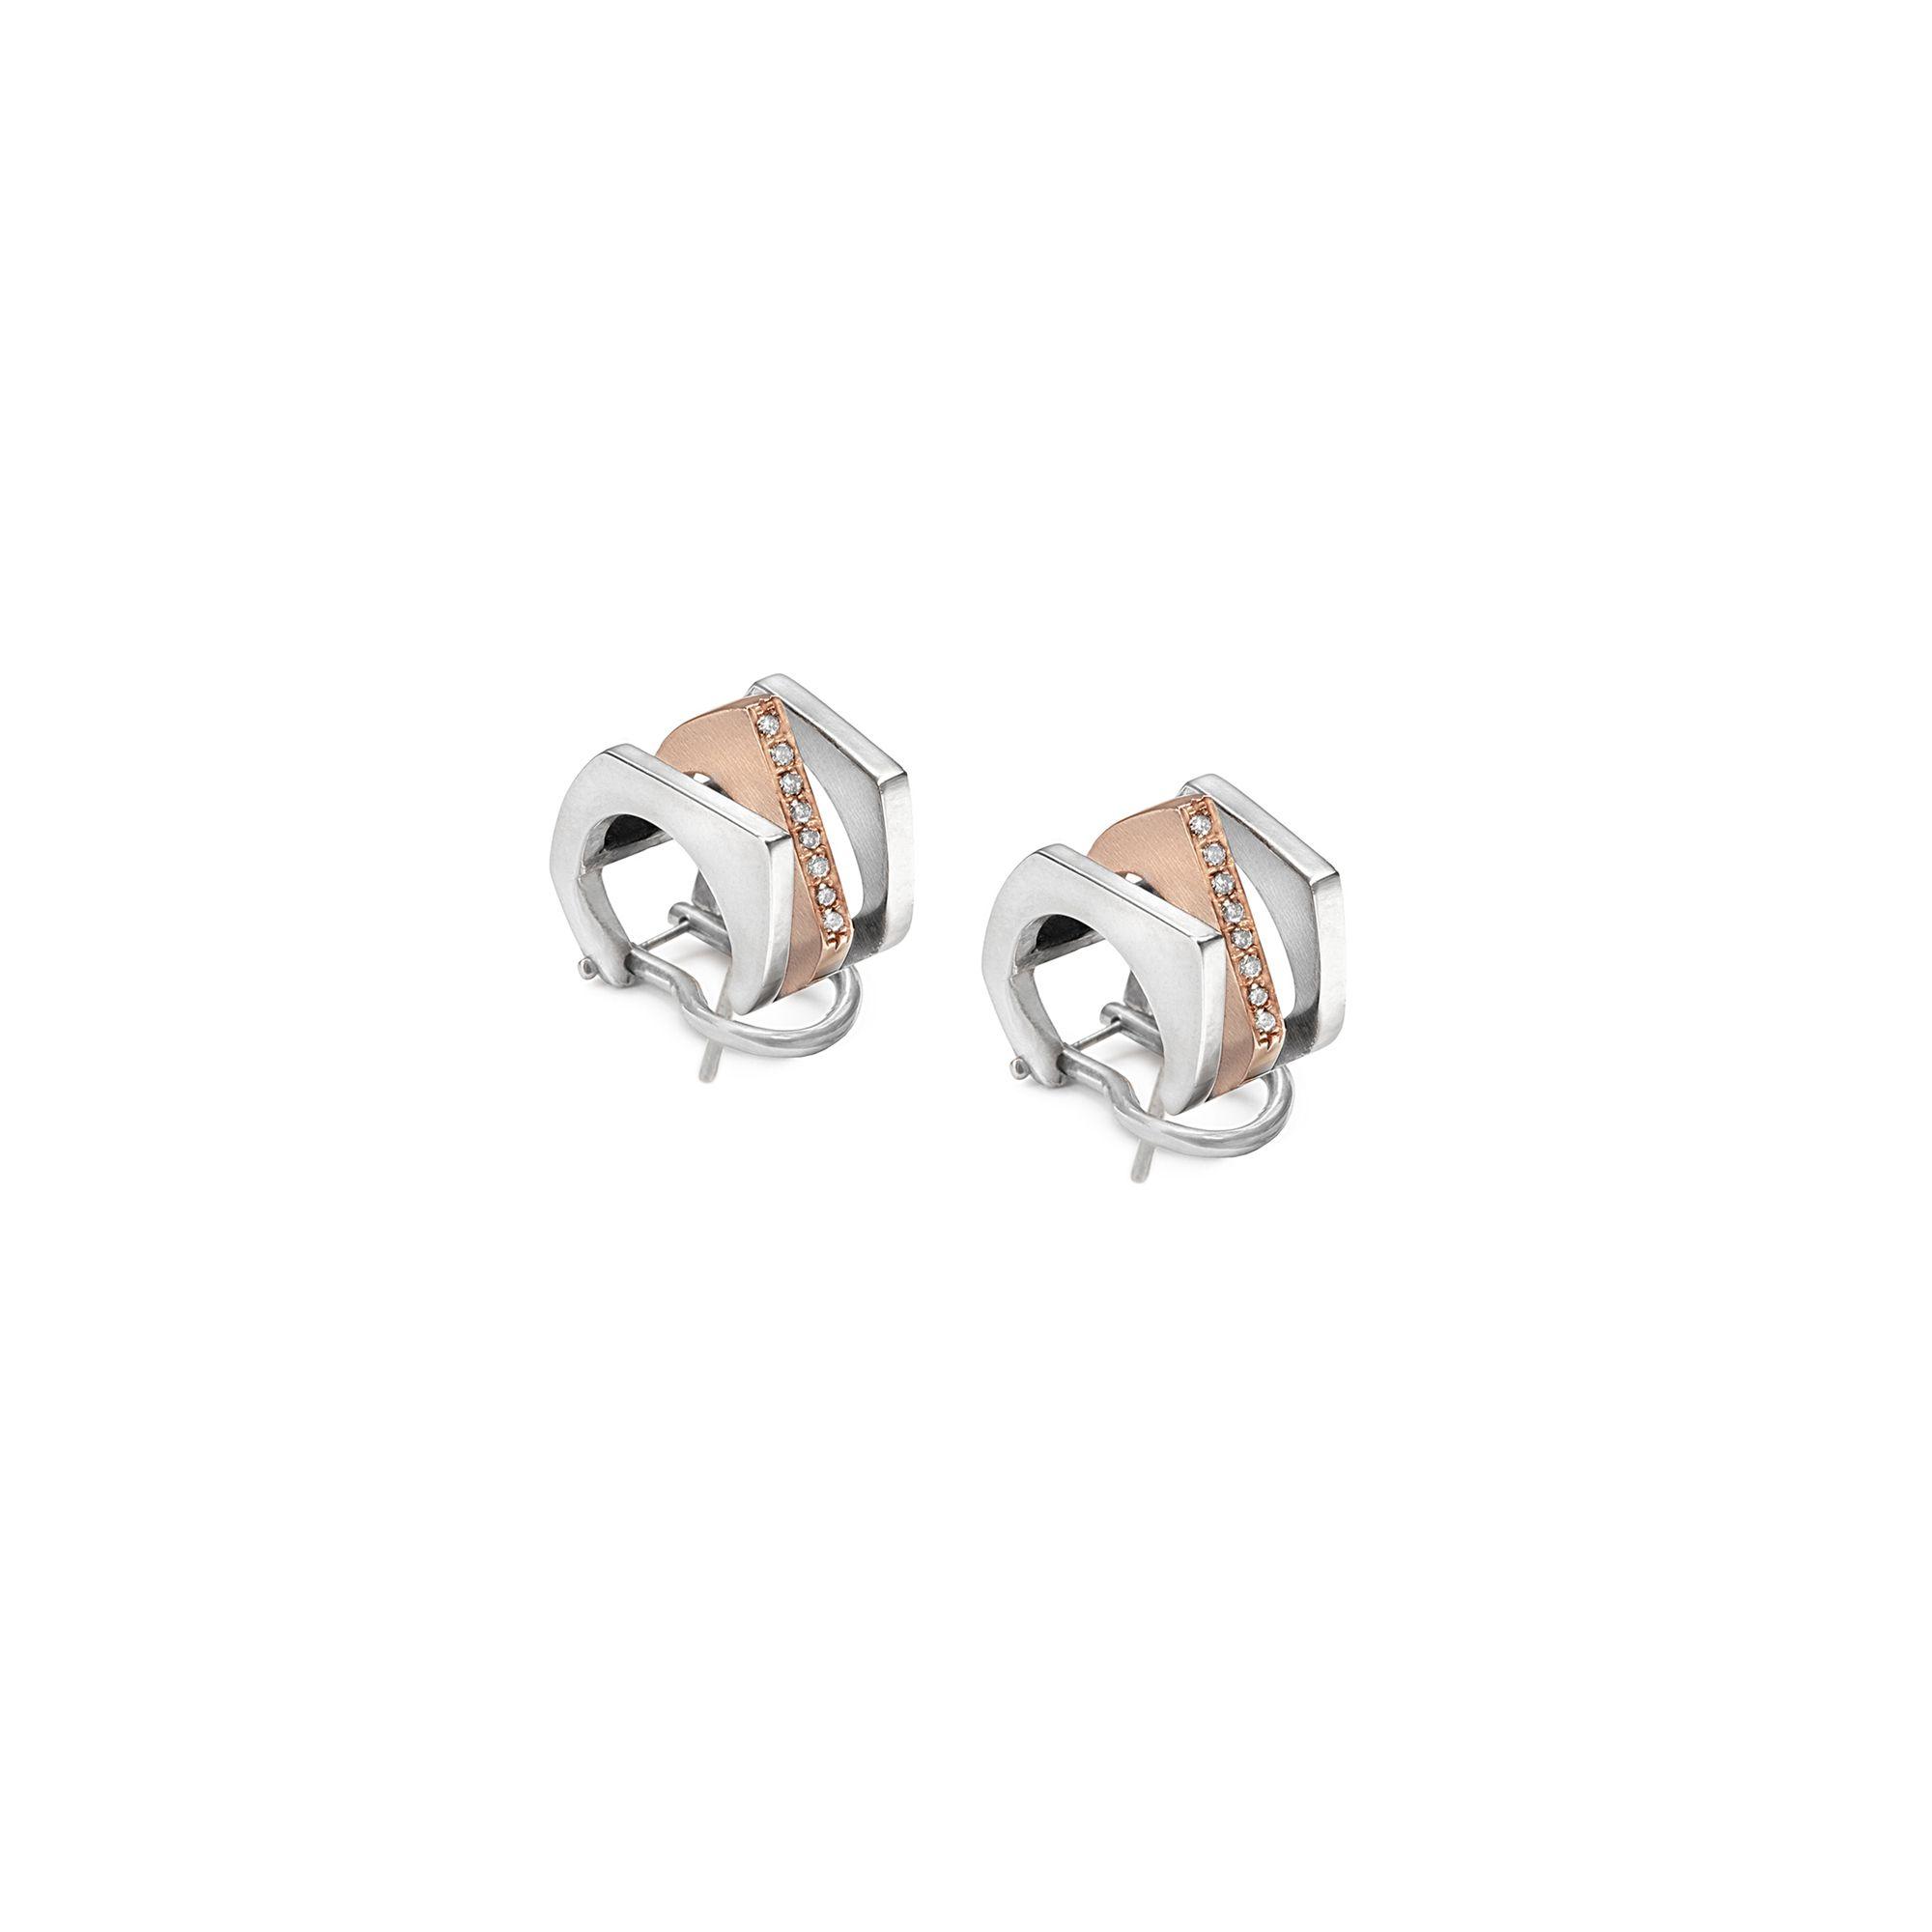 3 element 'Congiunzioni' earrings in silver and rose gold Earrings in silver and rose gold with pave diamonds